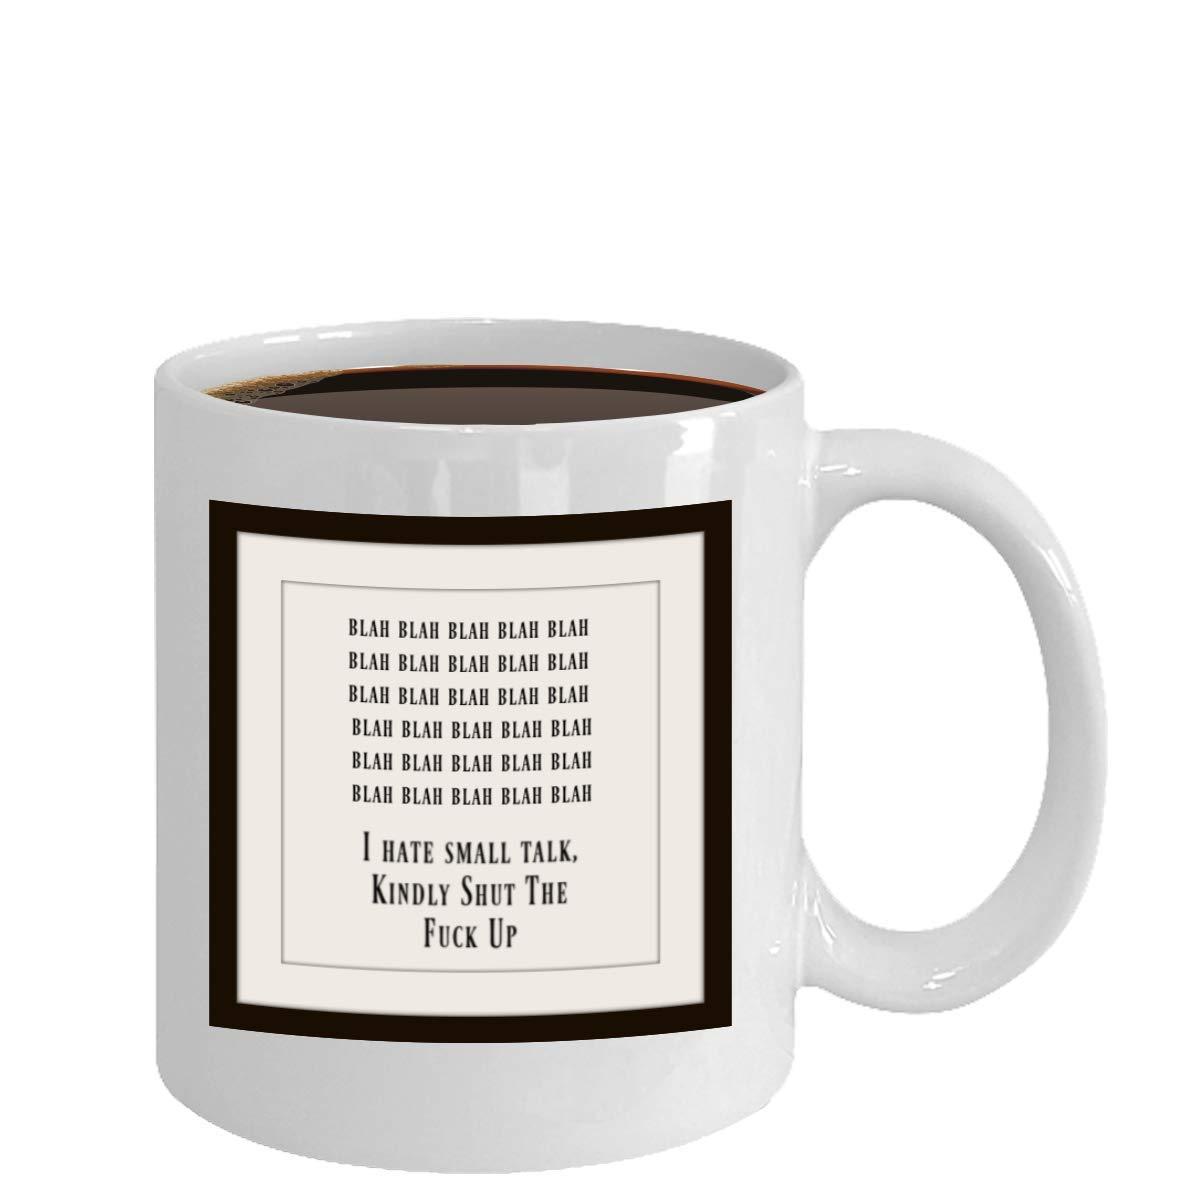 I hate Small Talk Classy Coffee Business Mug Shut the Fuck Up Kindly